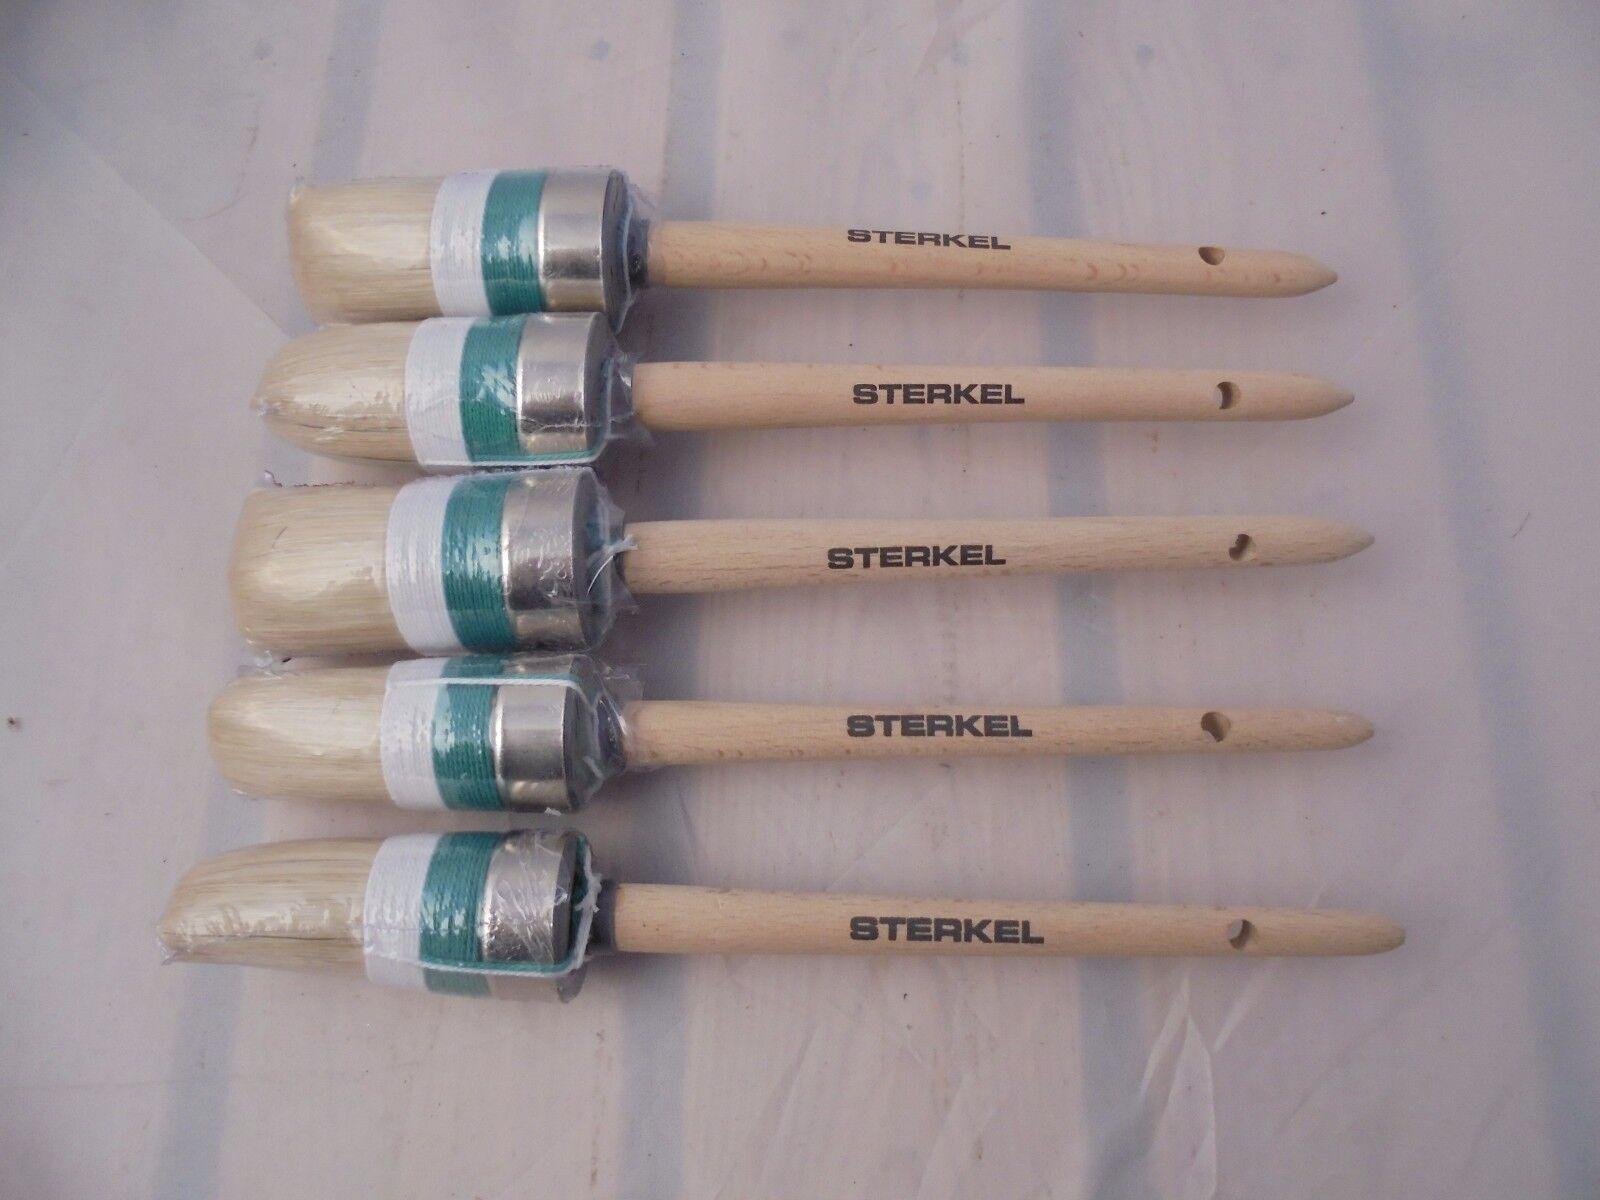 5 tlg. tlg. tlg. Profi Set Sterkel Ringpinsel Pinsel   Exquisite (mittlere) Verarbeitung  457b6e